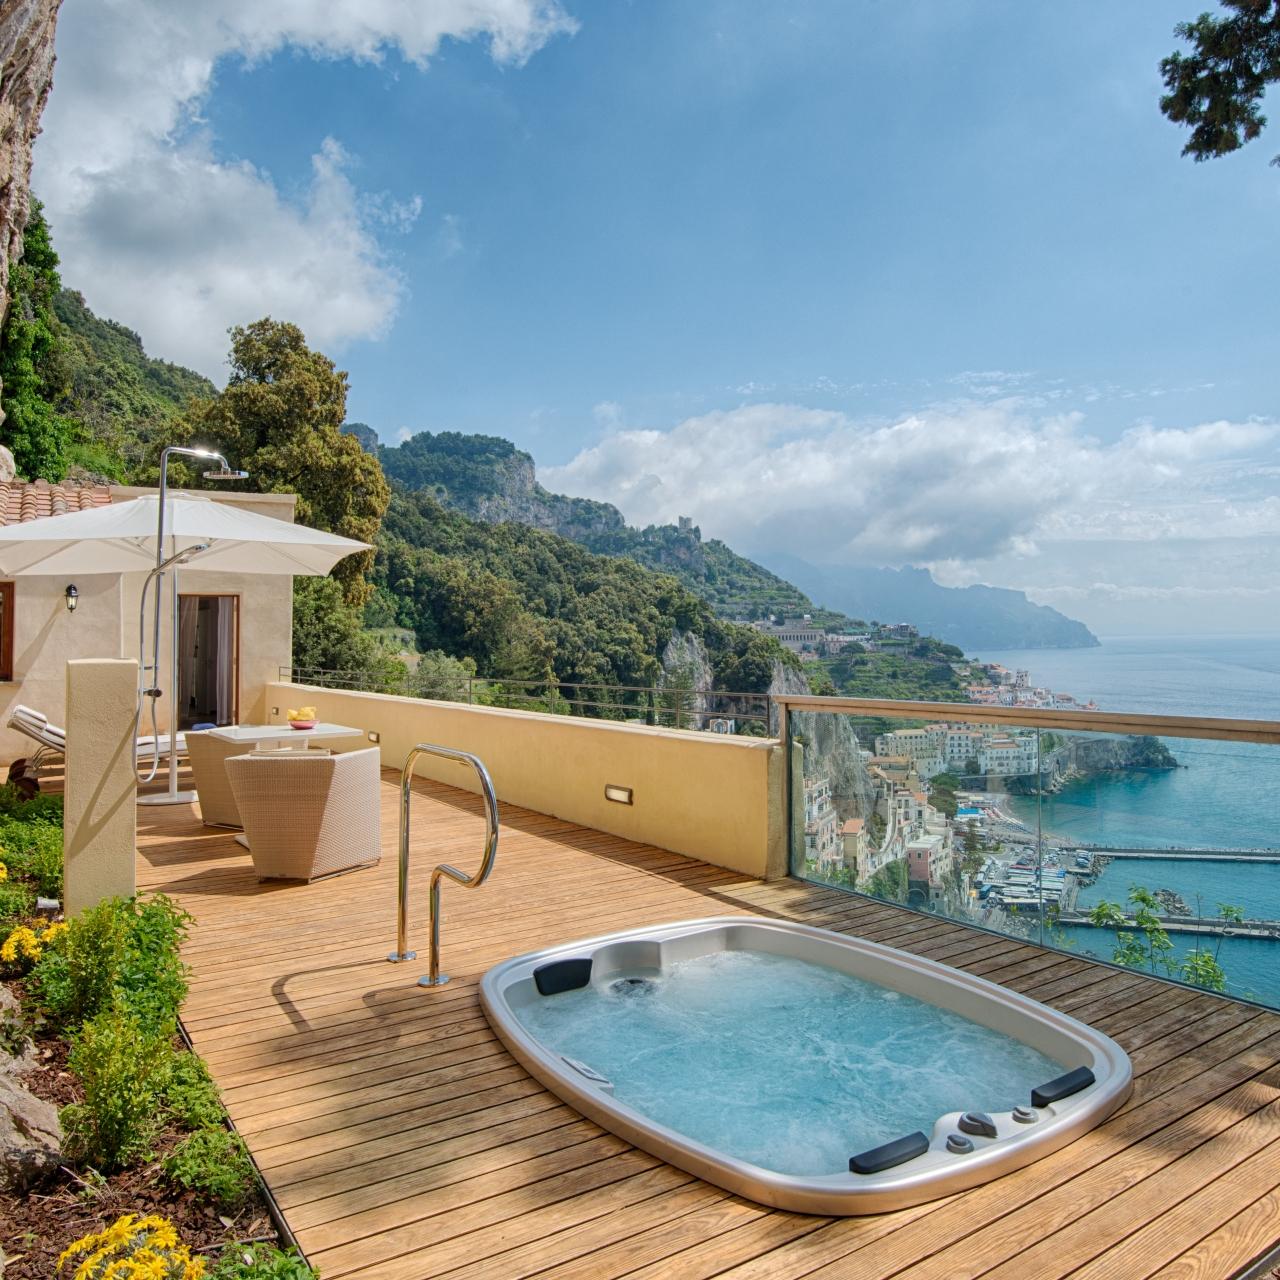 Nh Collection Grand Hotel Convento Di Amalfi Italien Bei Hrs Mit Gratis Leistungen